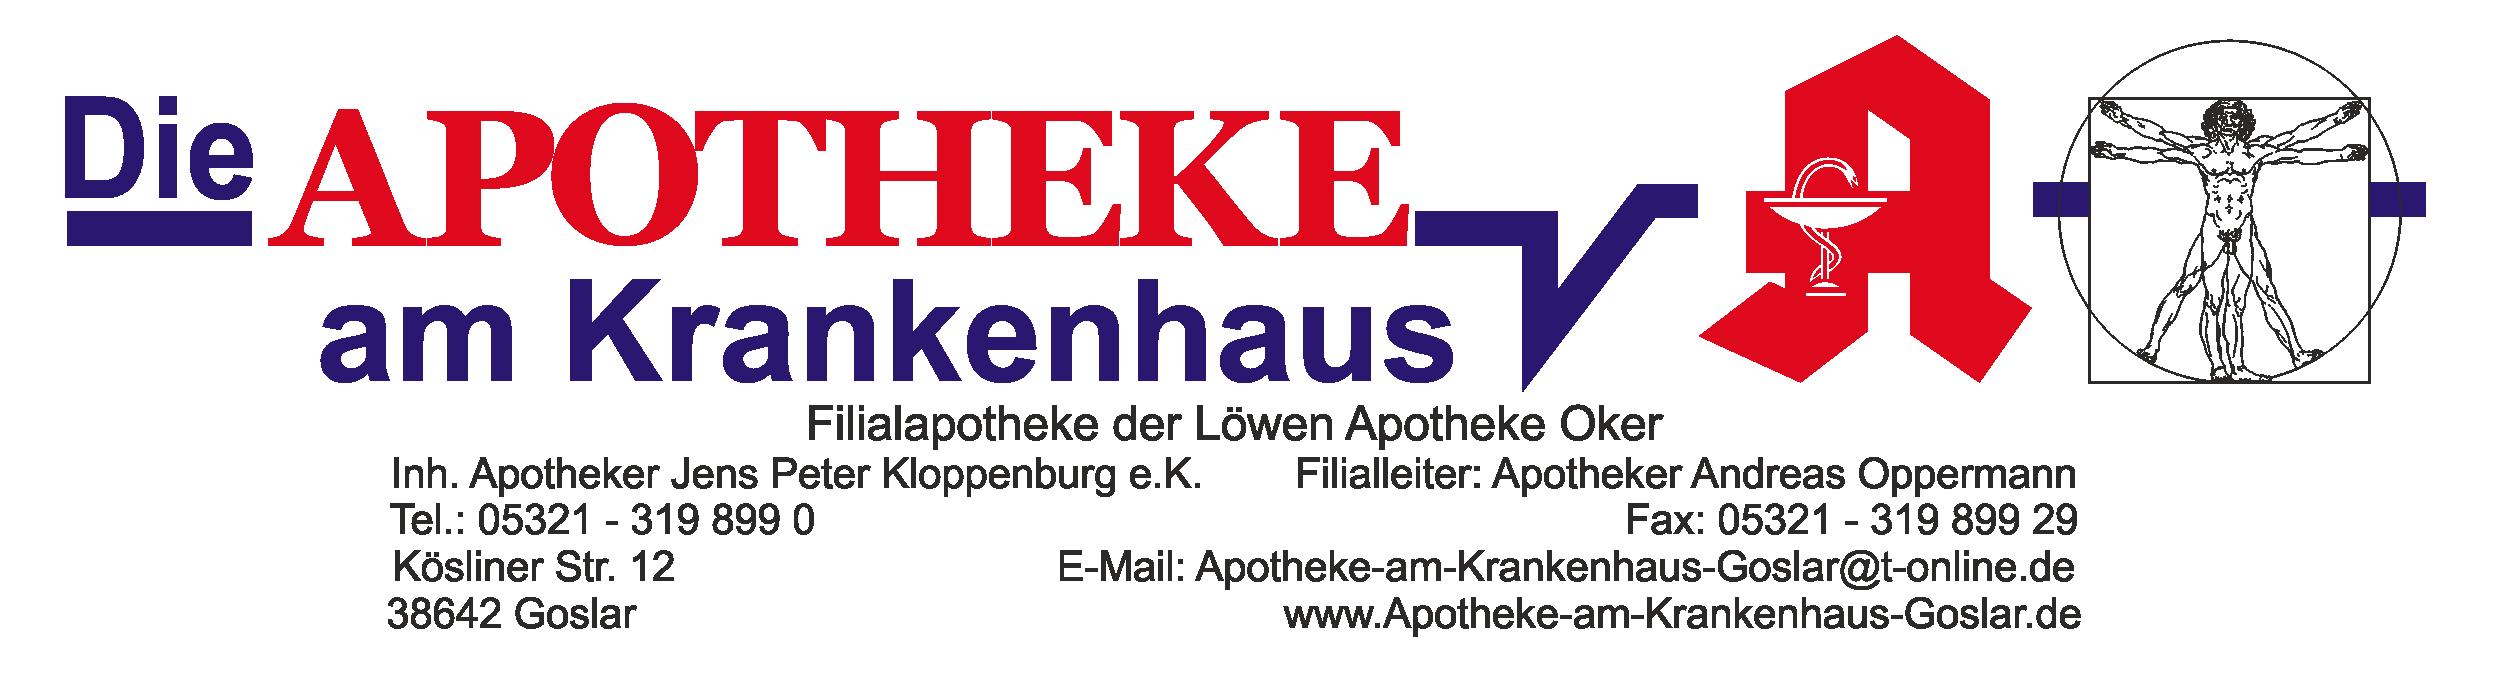 Logo Apotheke am Krankenhaus - Filialapotheke der Löwen Apotheke Oker